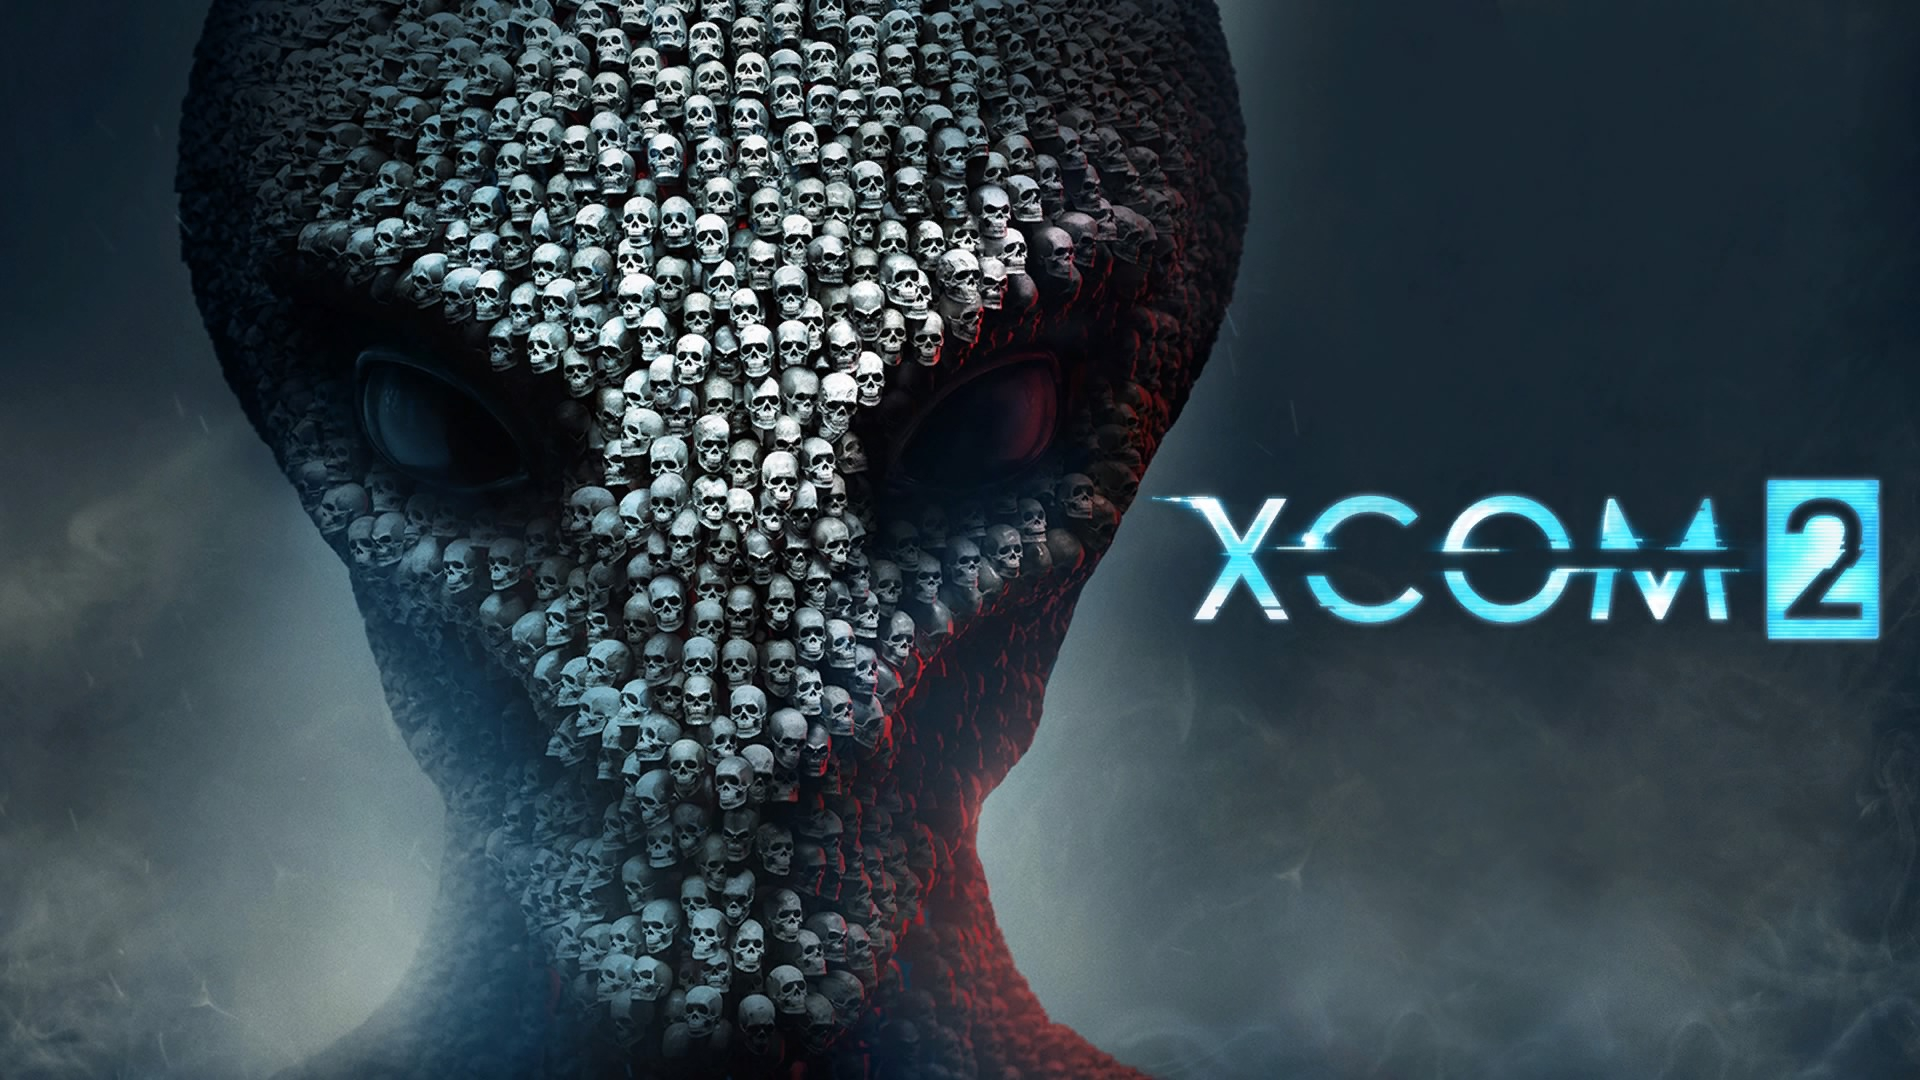 XCOM 2 title